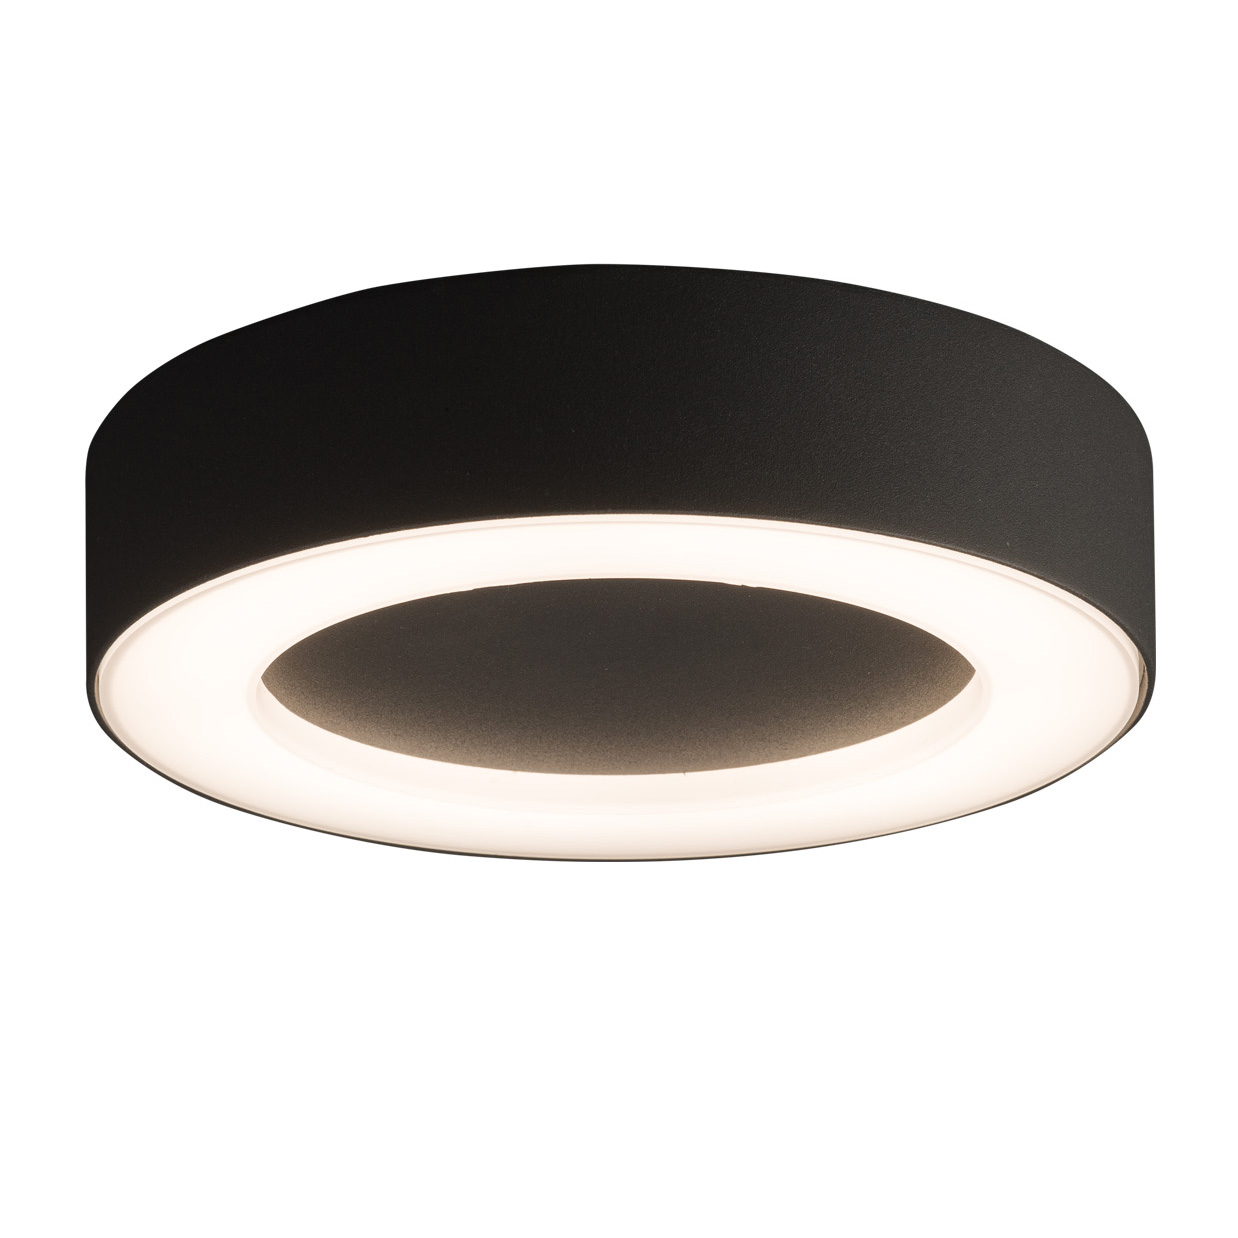 MERIDA LED graphite 9514 Nowodvorski Lighting